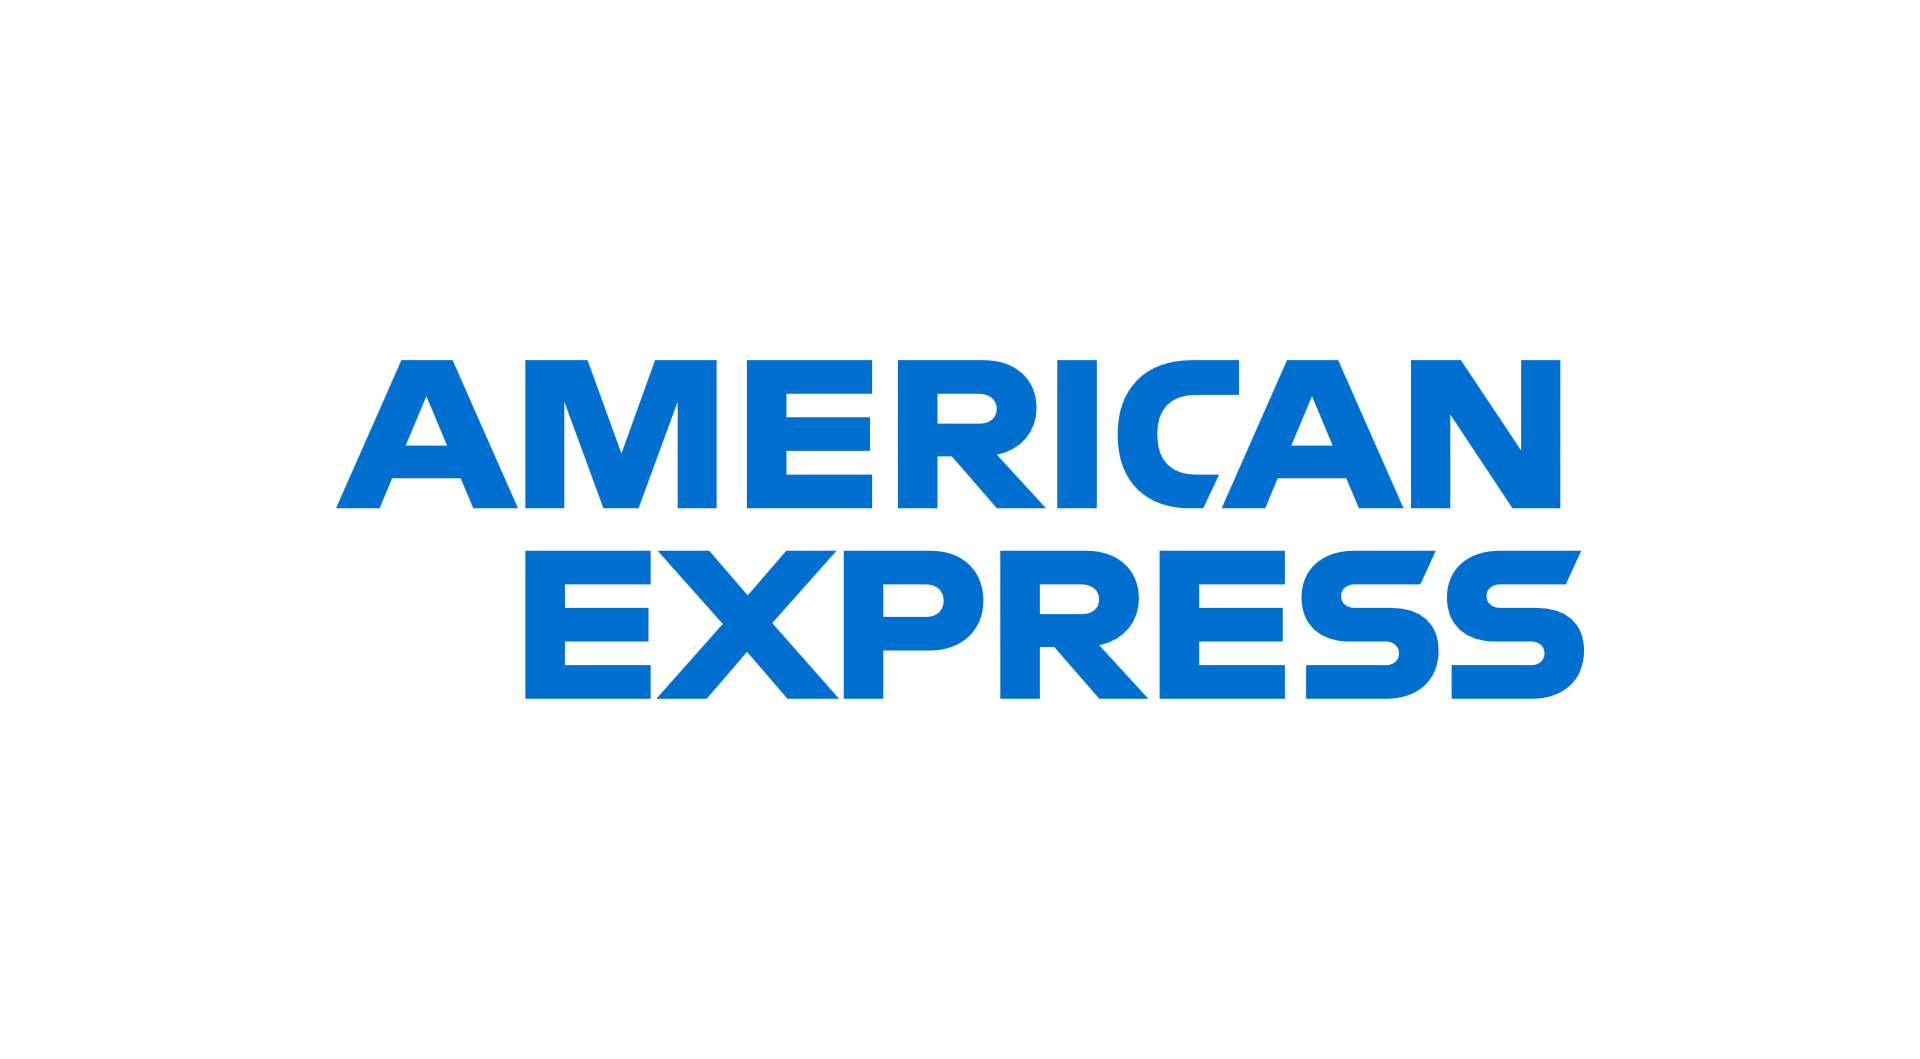 Synchroniser votre banque American Express avec iPaidThat